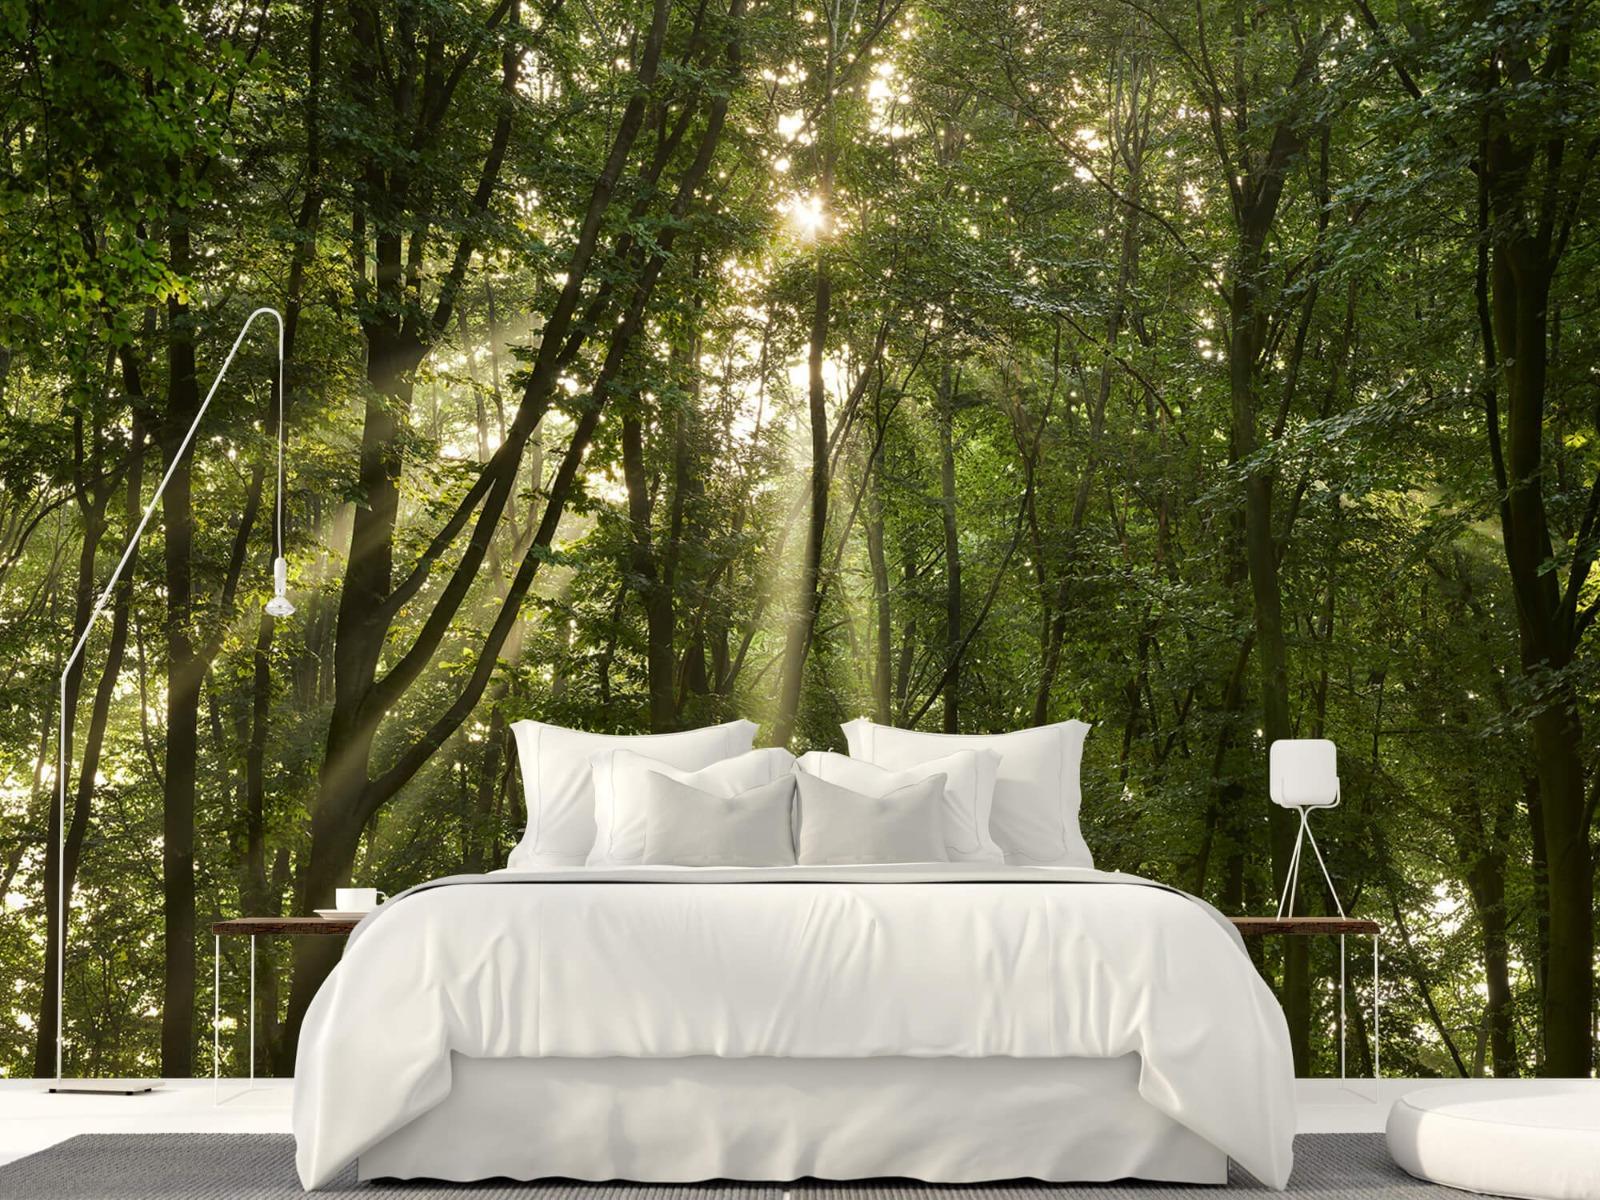 Bomen - Zonnestralen in het bos - Slaapkamer 16